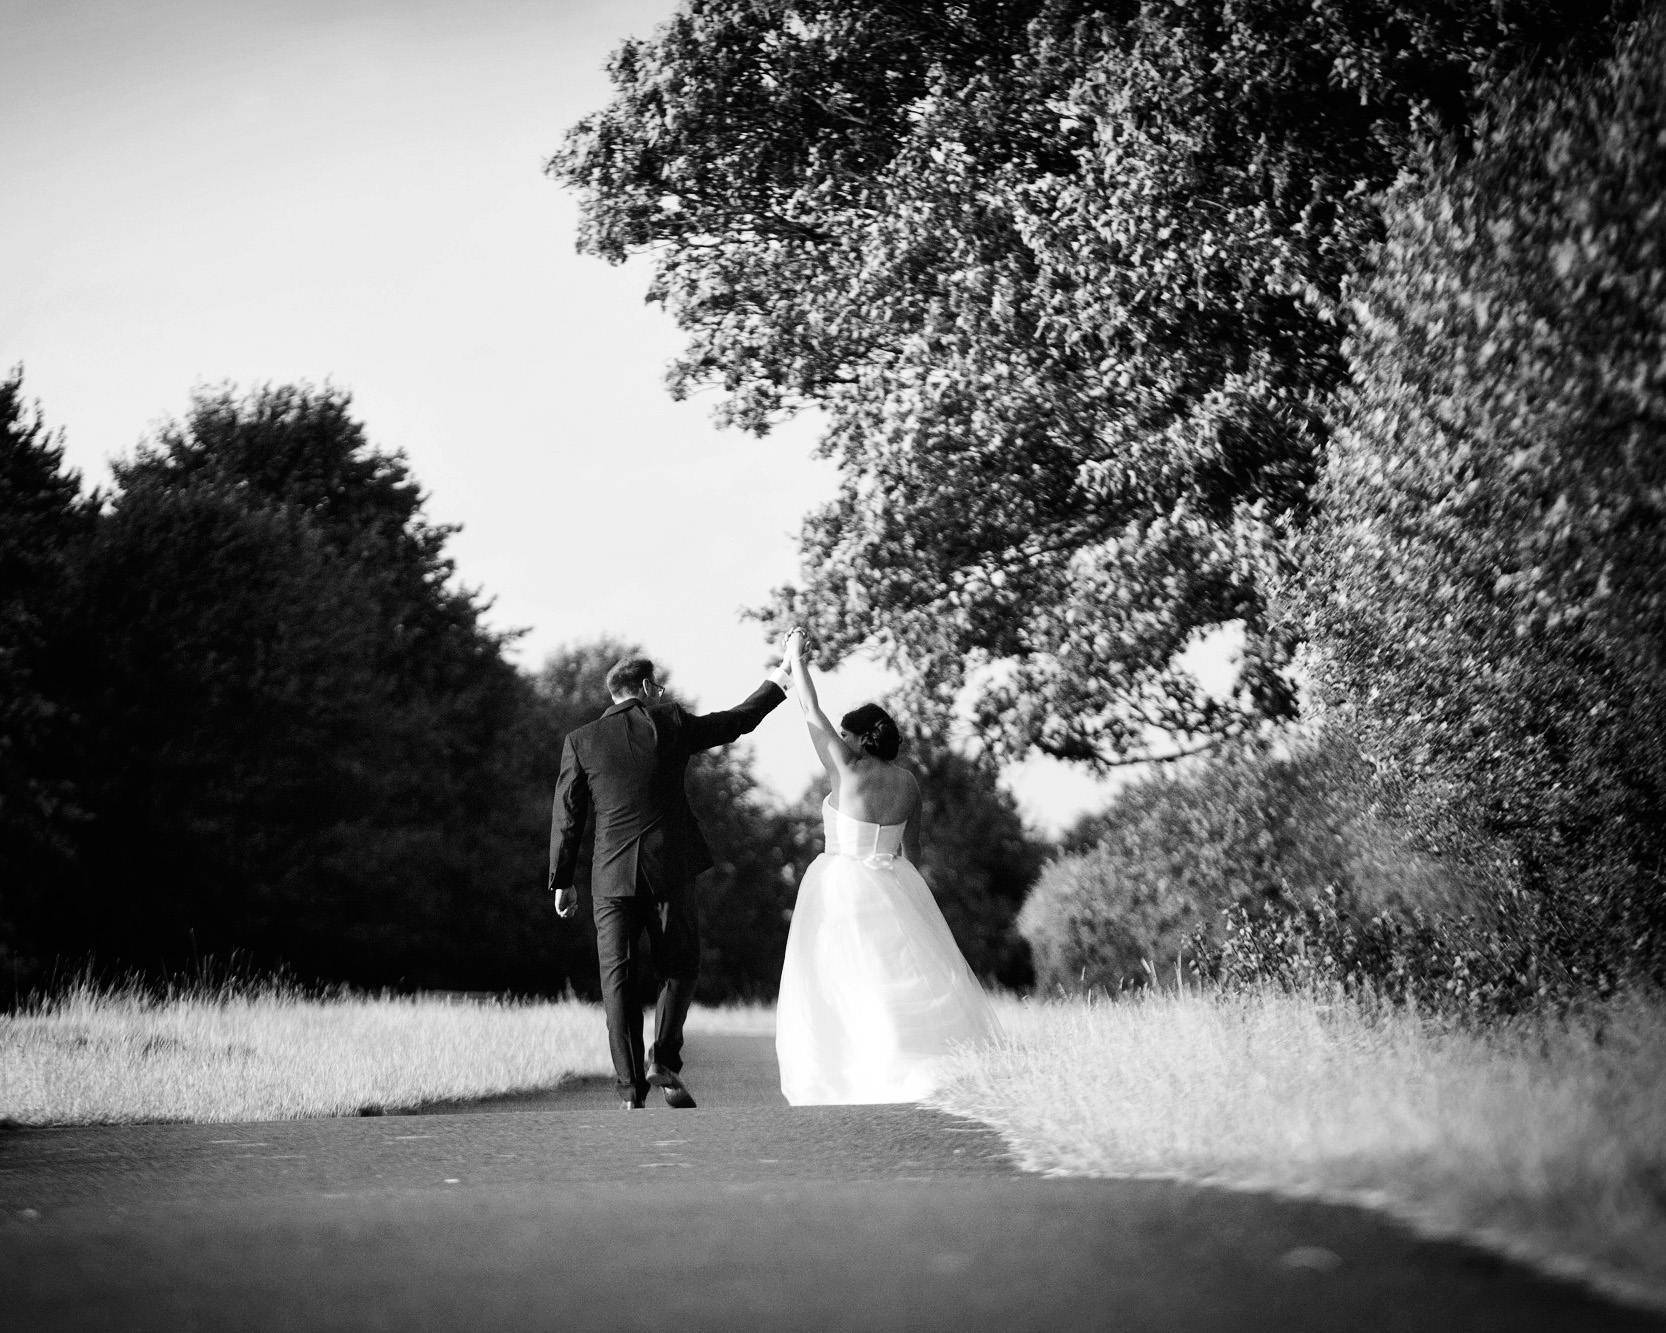 wedding at Normanton Park hotel (29).jpg